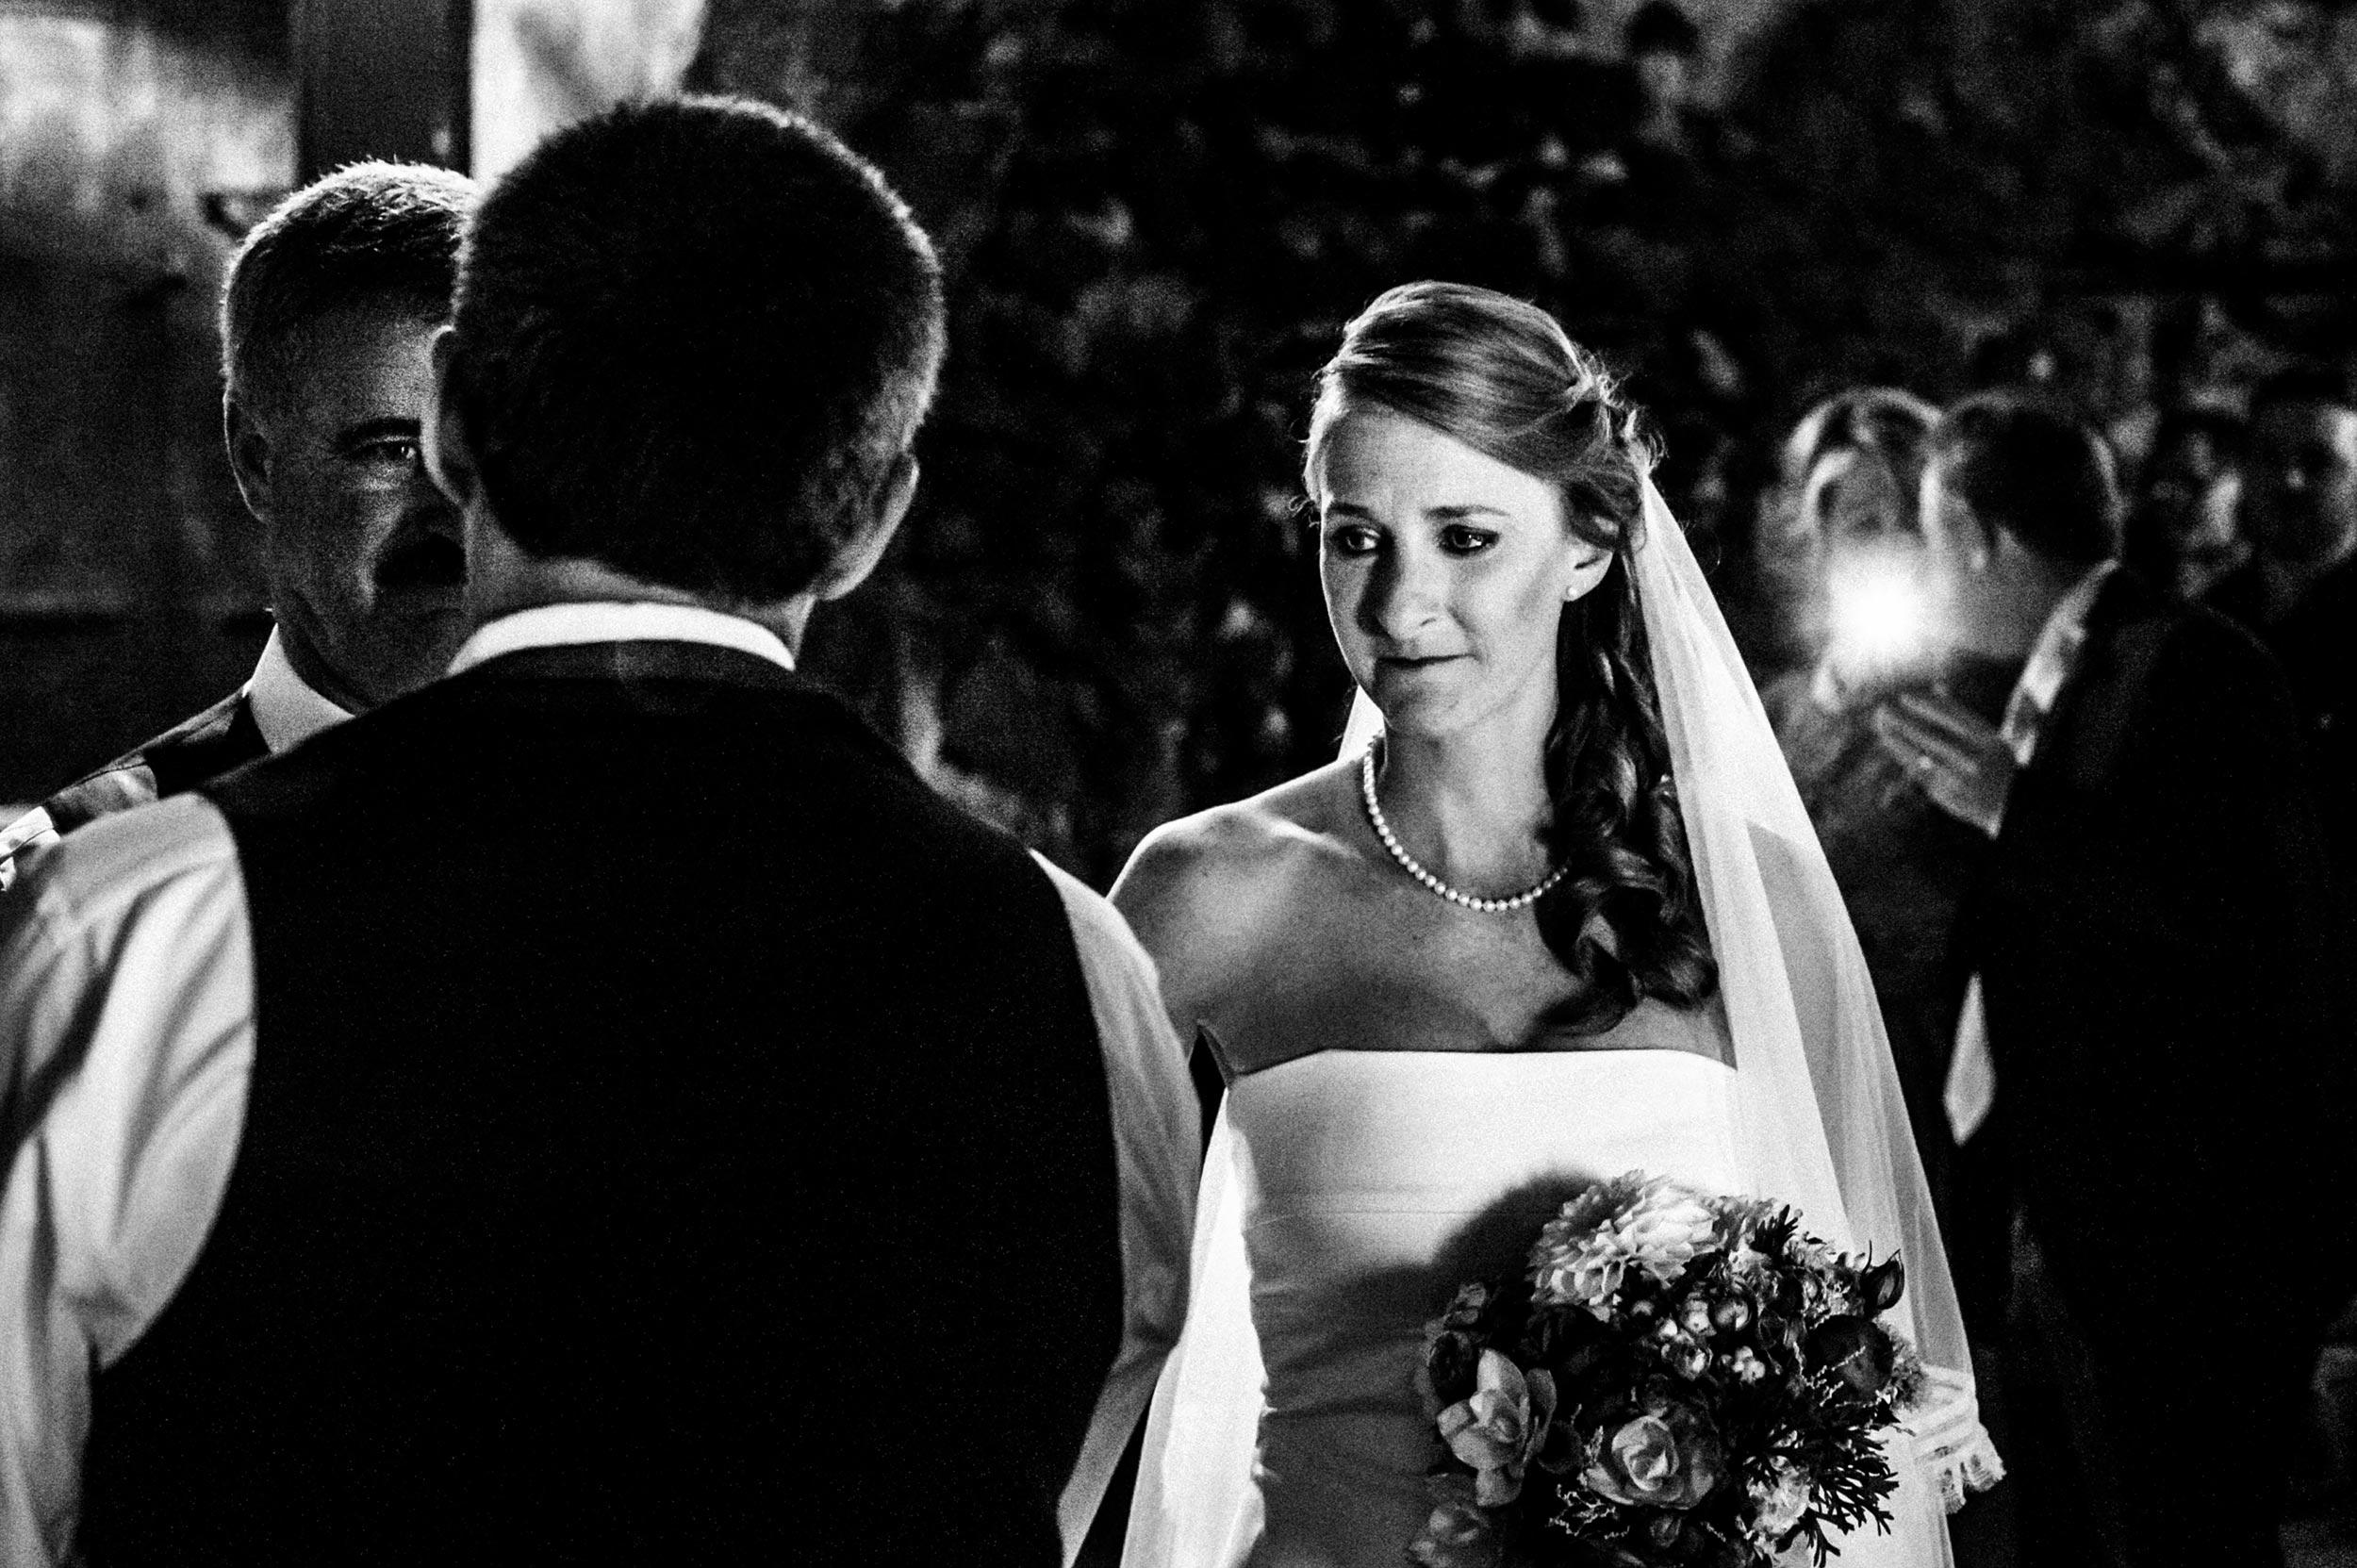 2014-Shelby-Jocelyn-Santo-Stefano-Di-Sessanio-Wedding-Photographer-Italy-Alessandro-Avenali-29.jpg